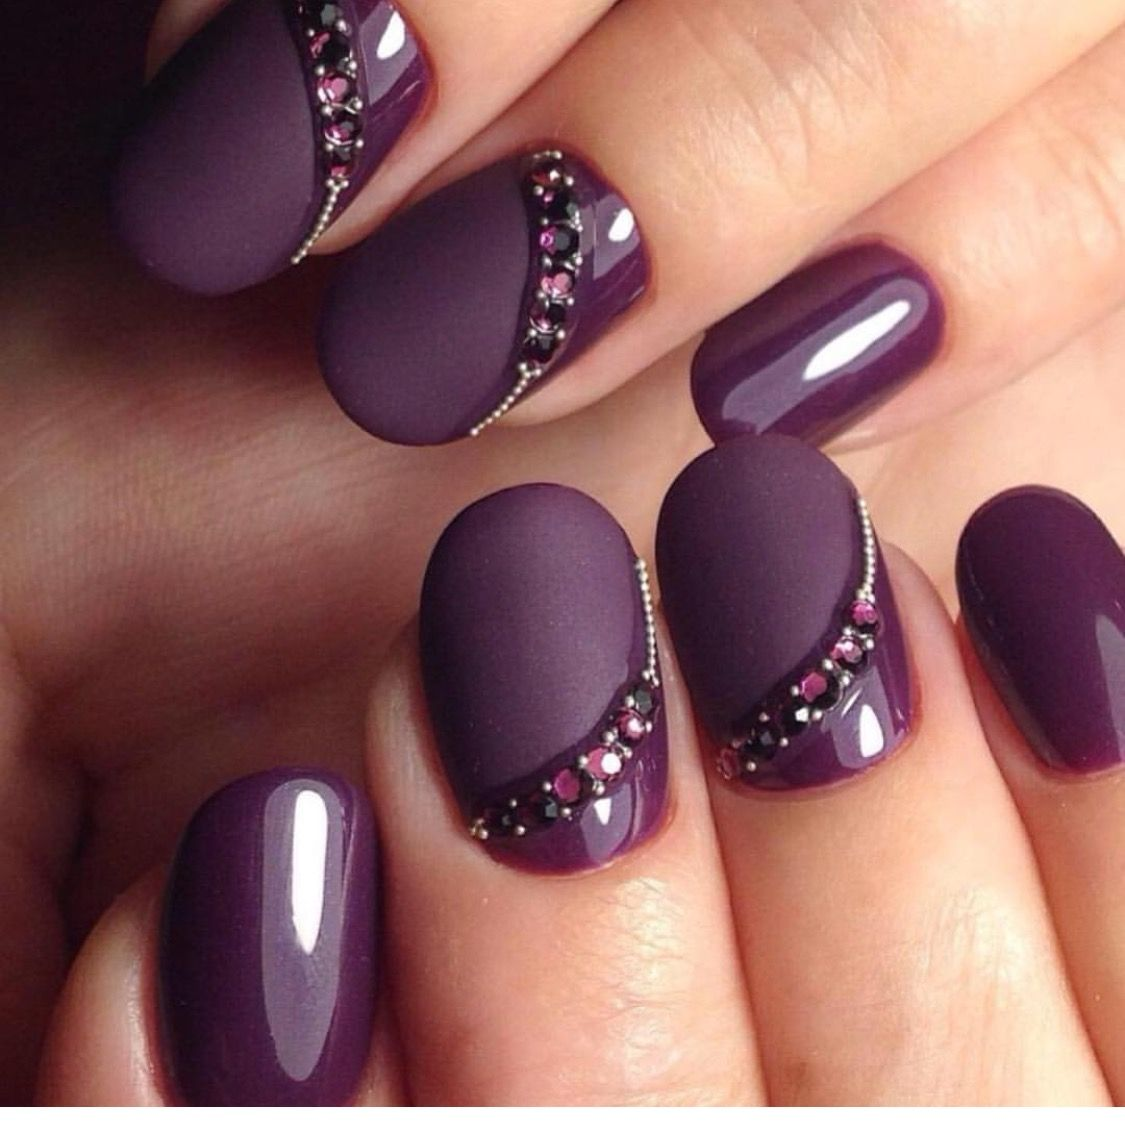 Elegantly Done Nails Love The Subtle Sophistication Nails Nehty Uprava Nehtu A Design Nehtu